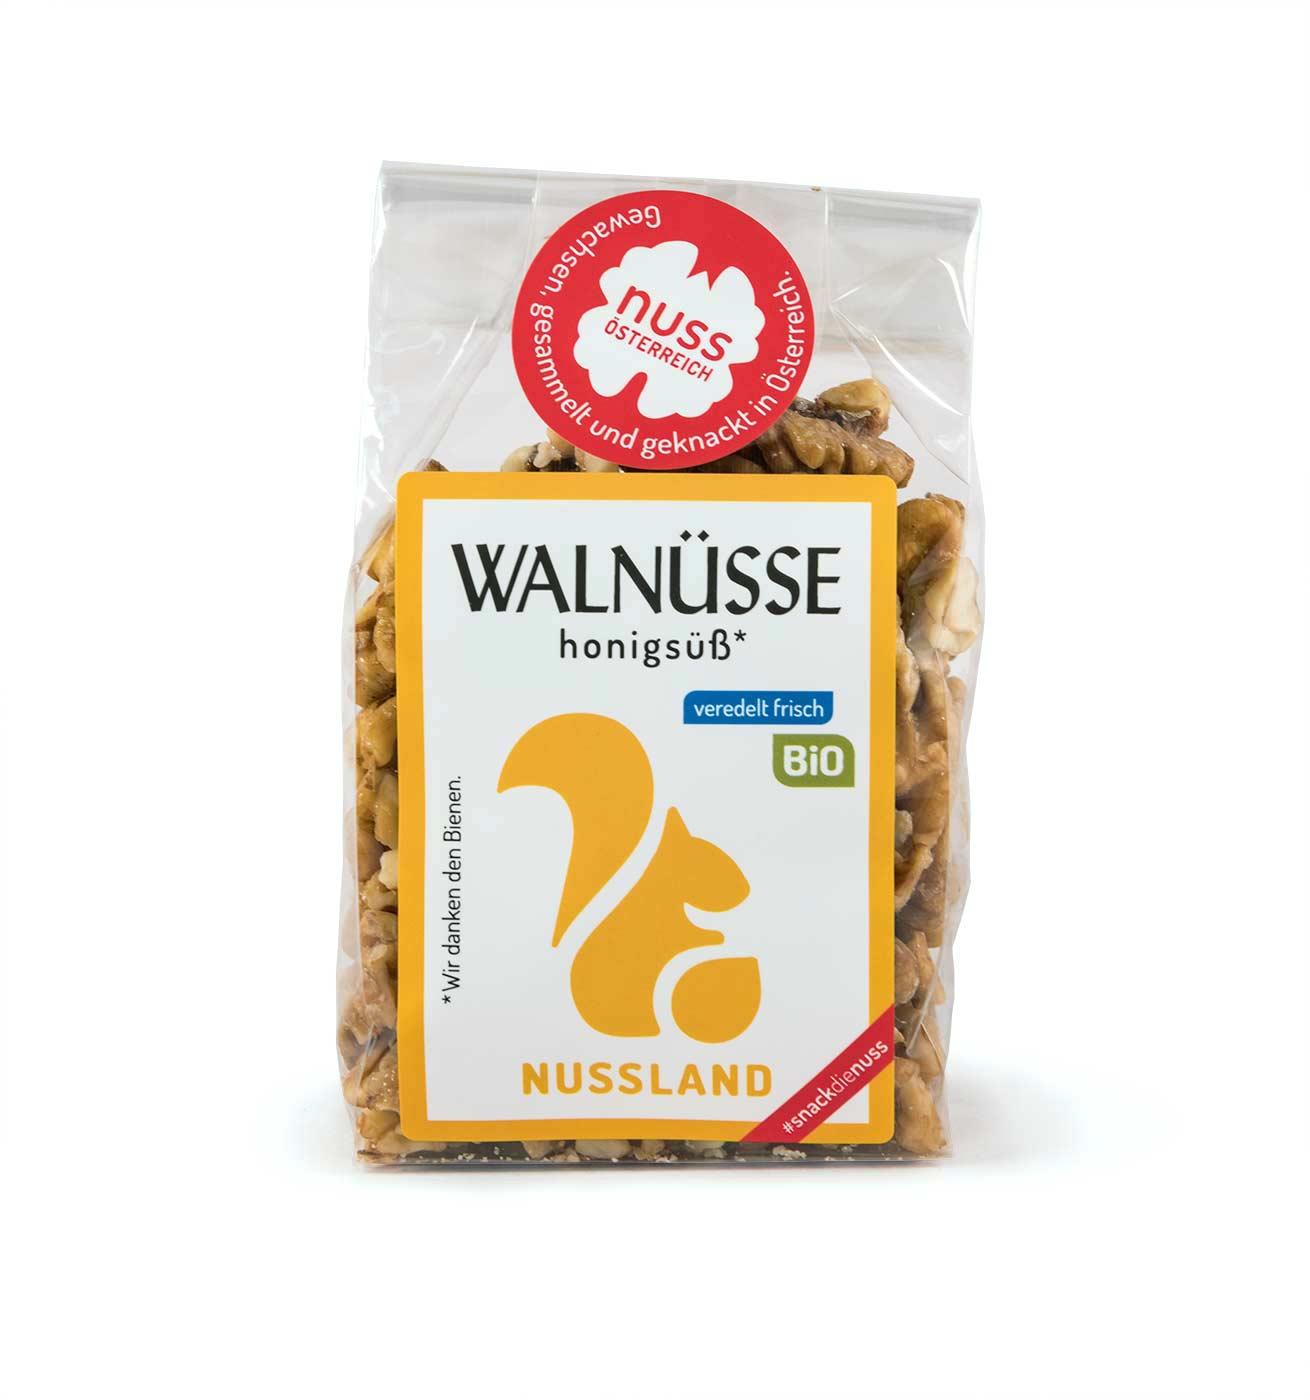 BIO Walnuss-Snack 'Honigsüß'